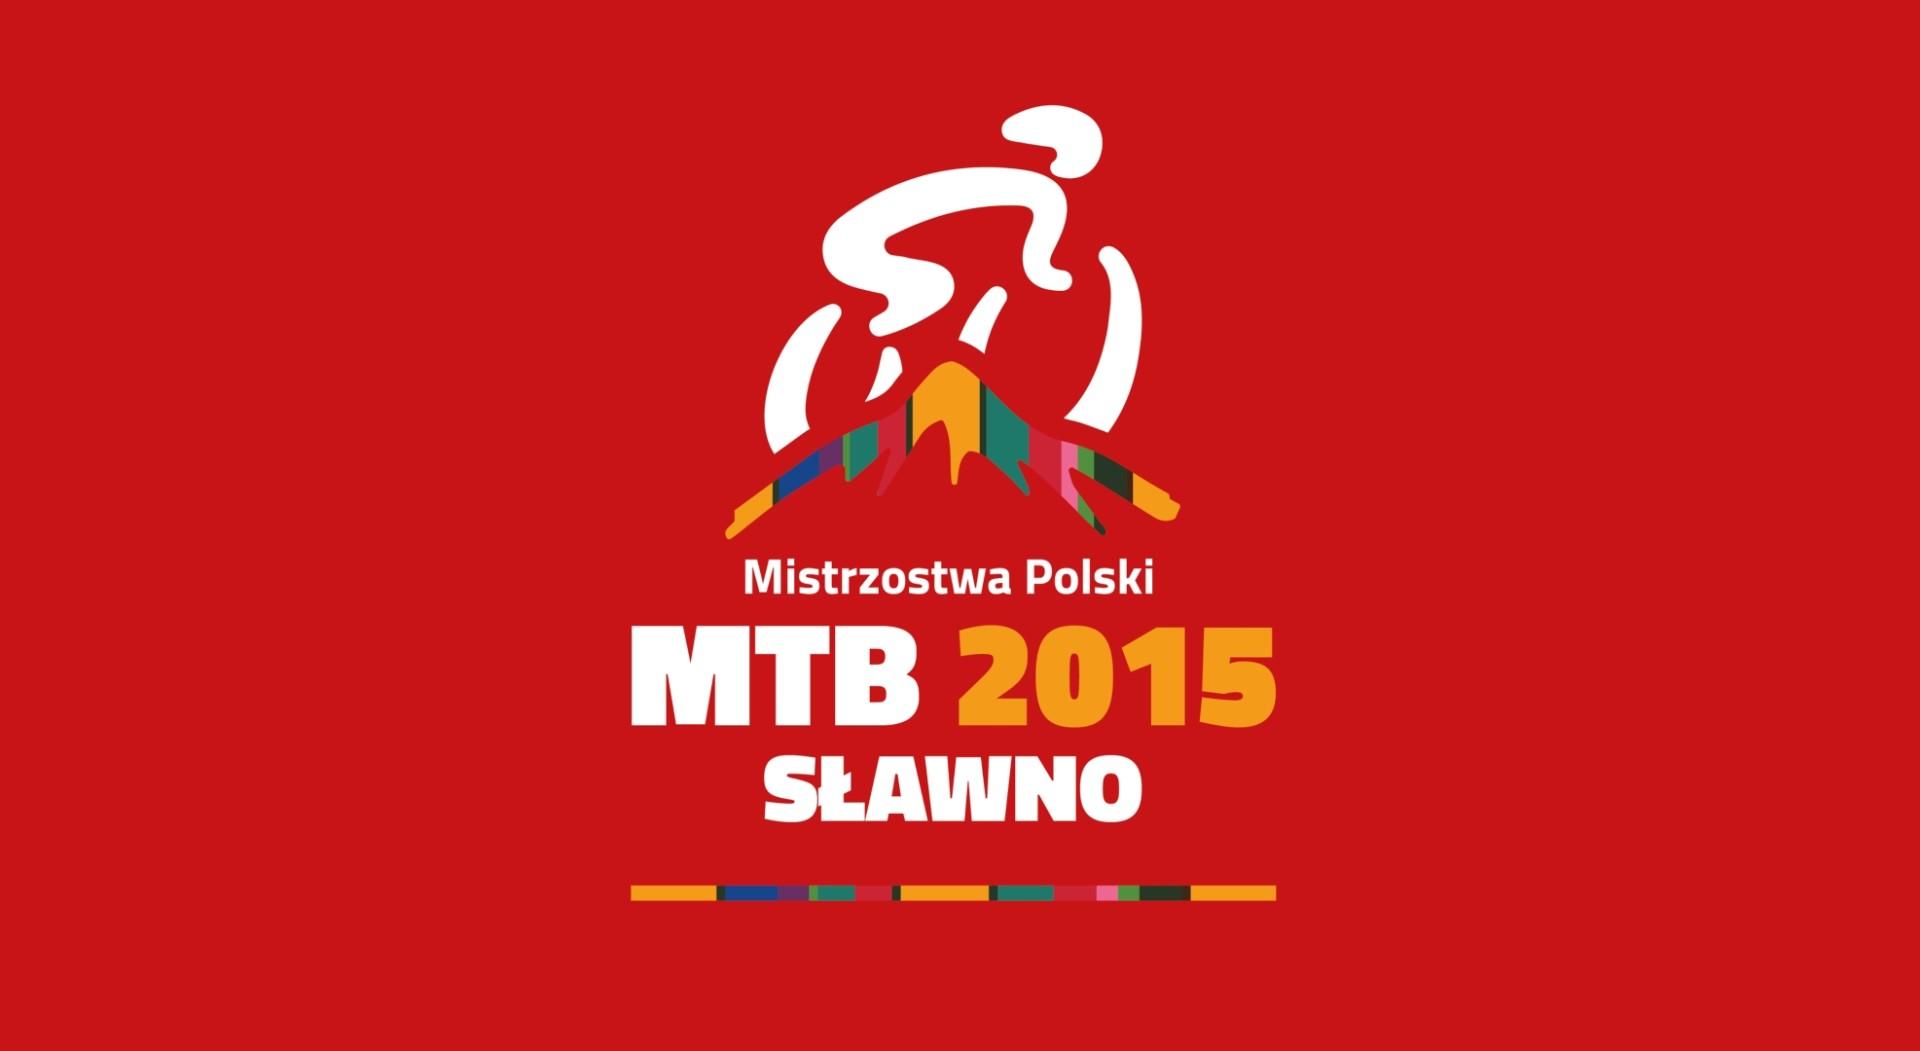 MP MTB 2015 – transmisja na żywo